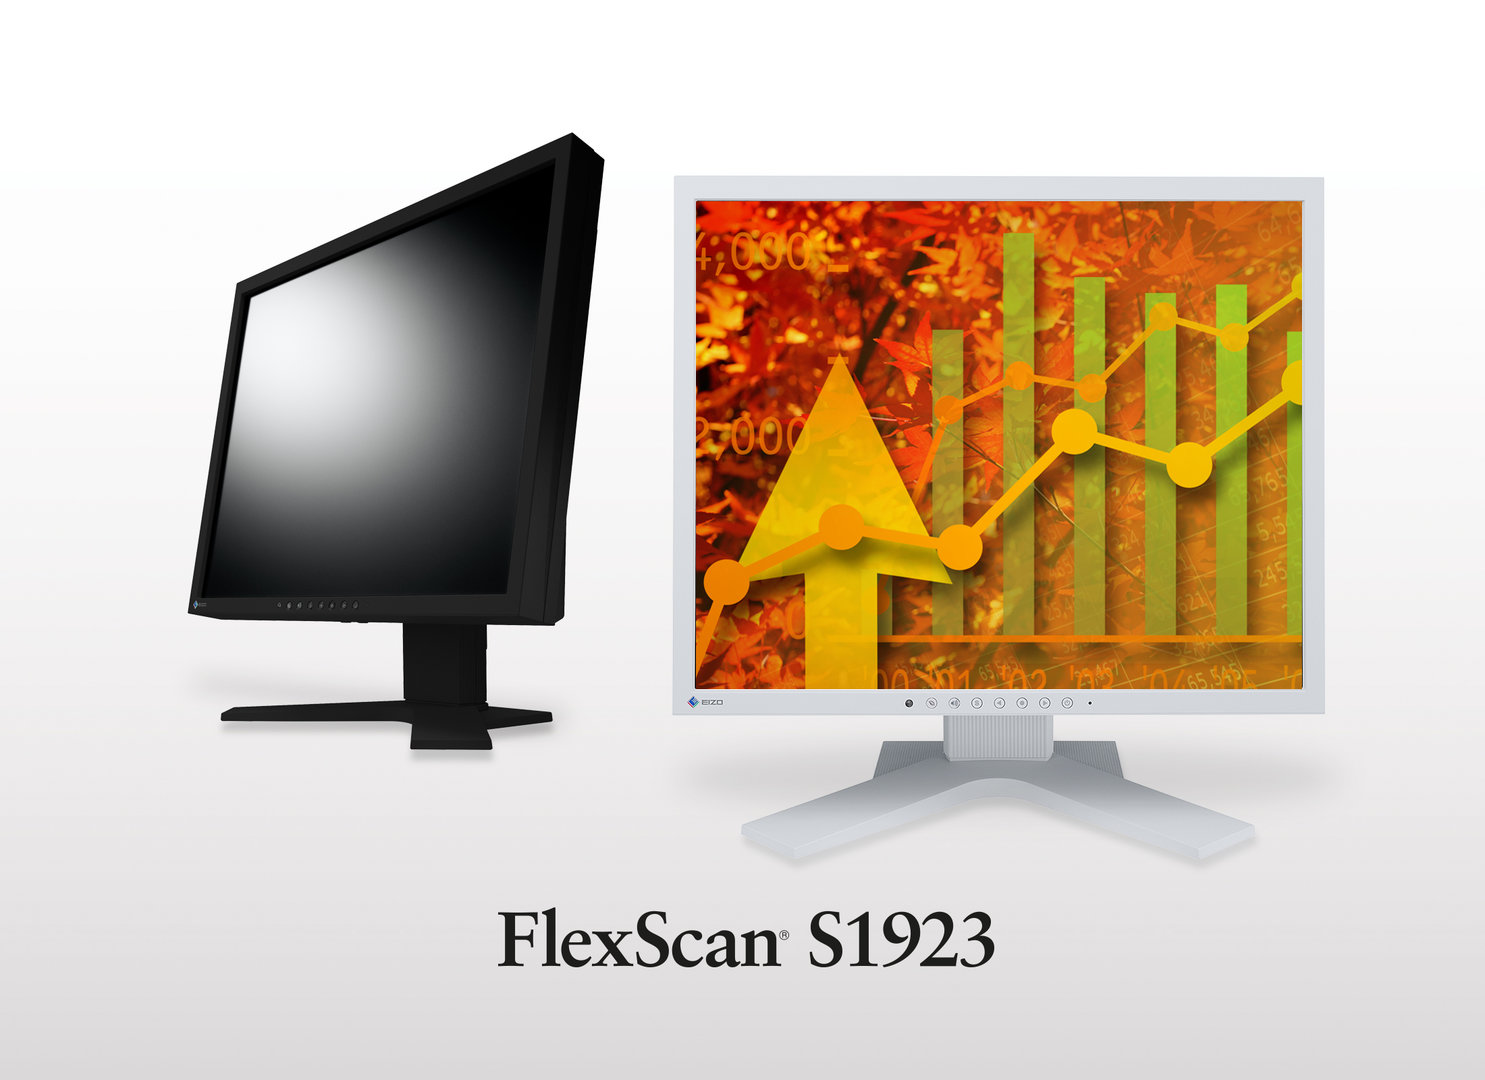 Eizo FlexScan S1923